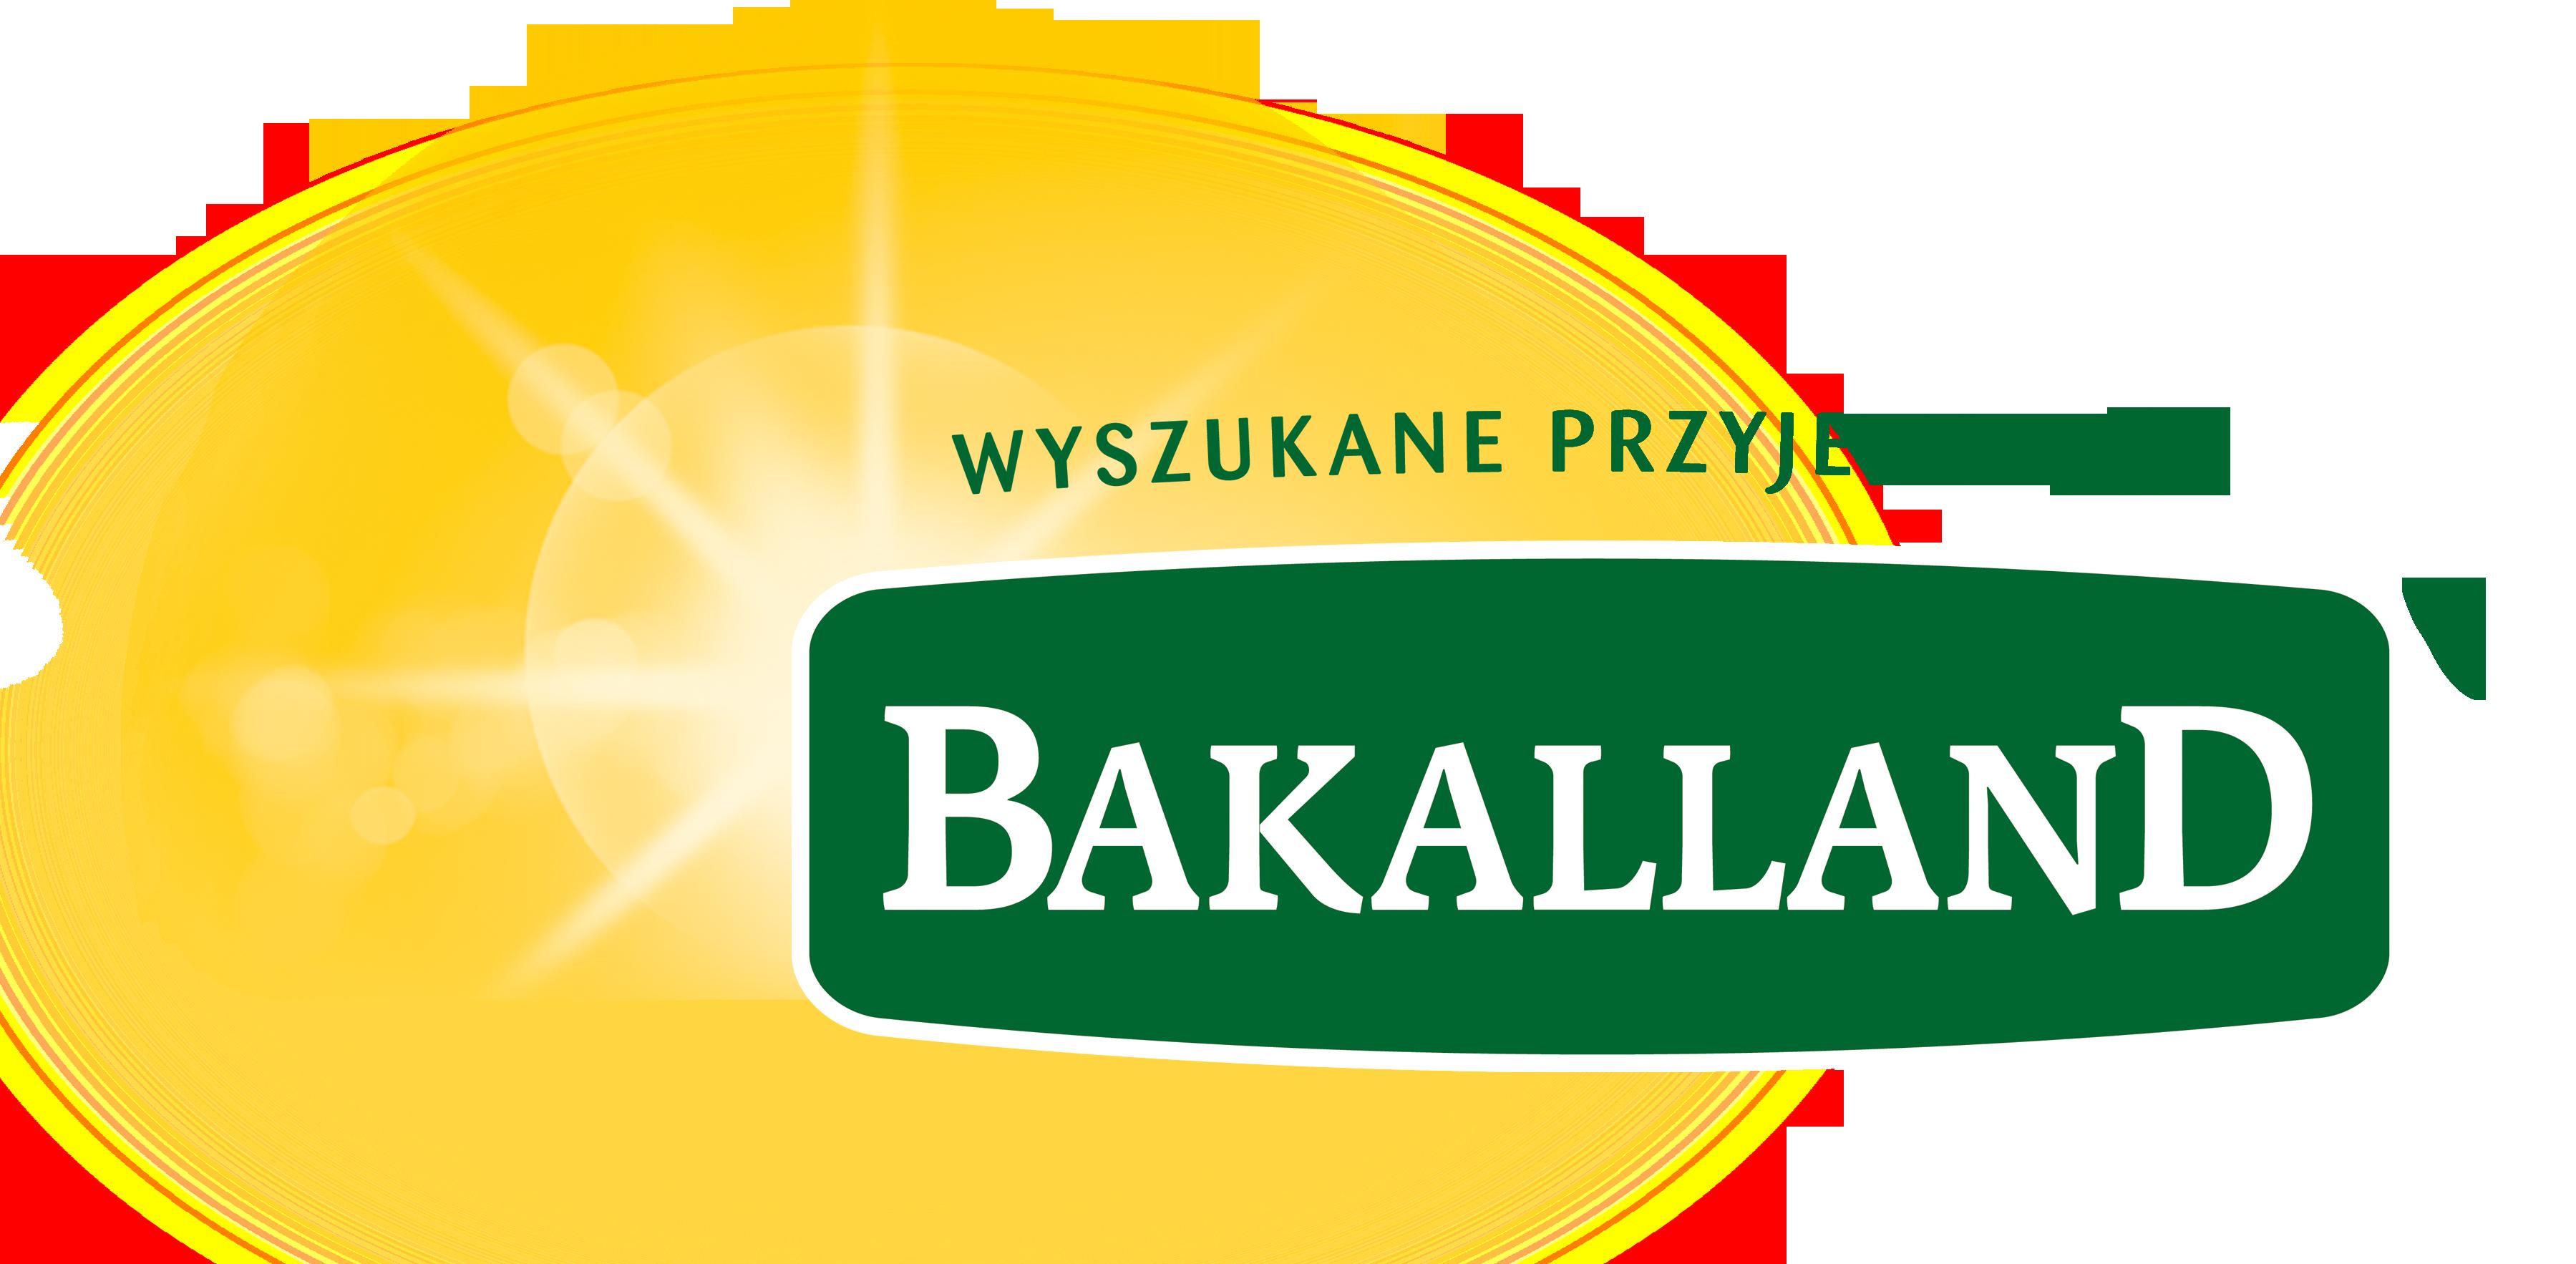 Podsumowanie roku Grupy Bakalland